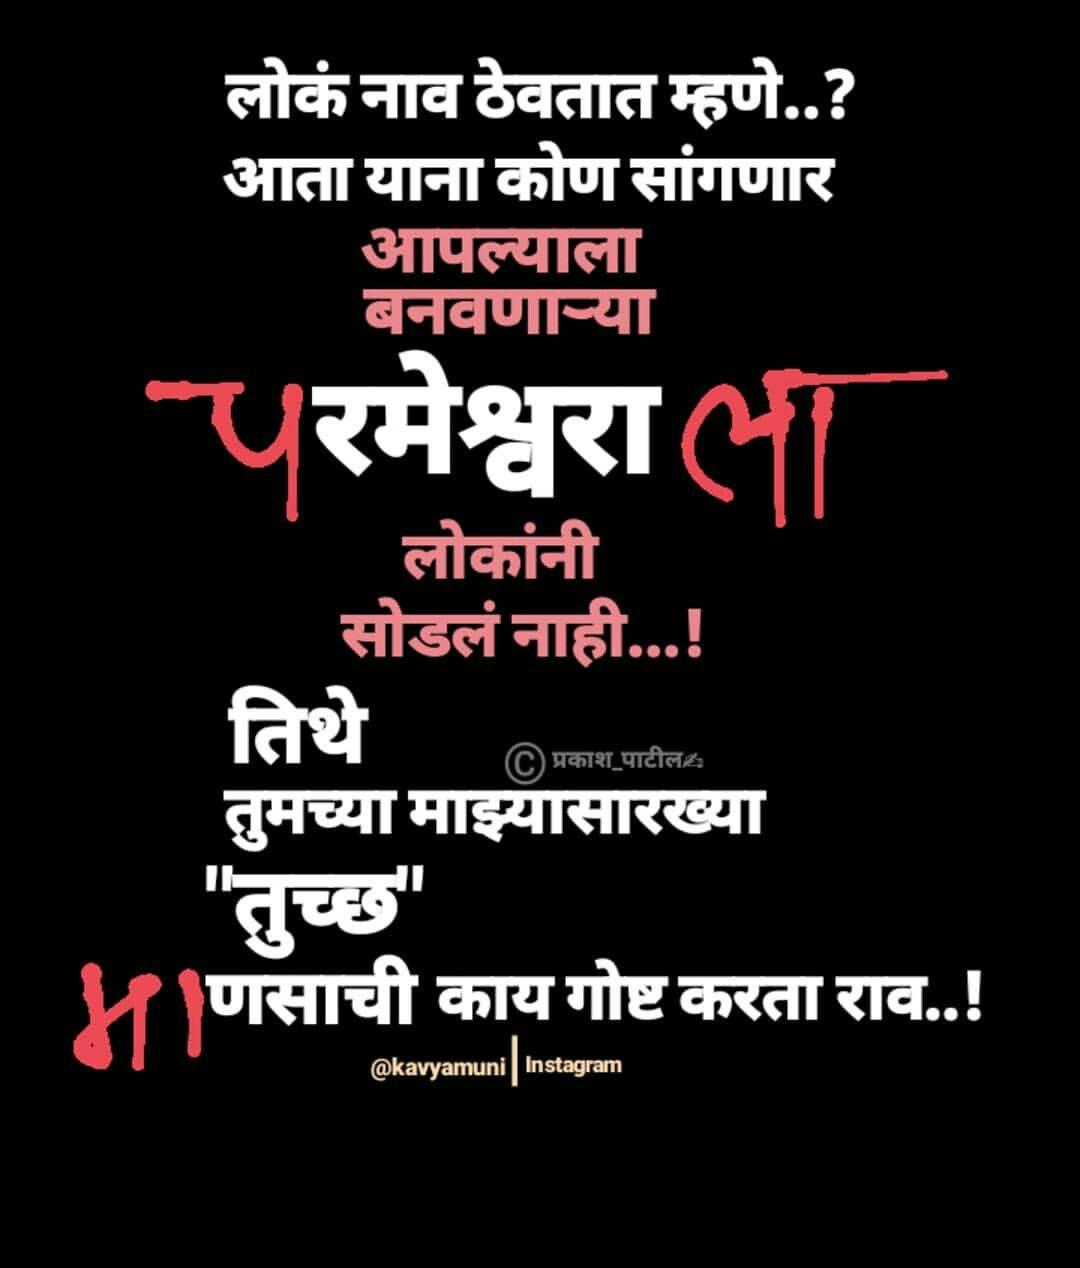 Pin By Appa Jadhav On Marathi Funny My Life Quotes Life Quotes Marathi Quotes